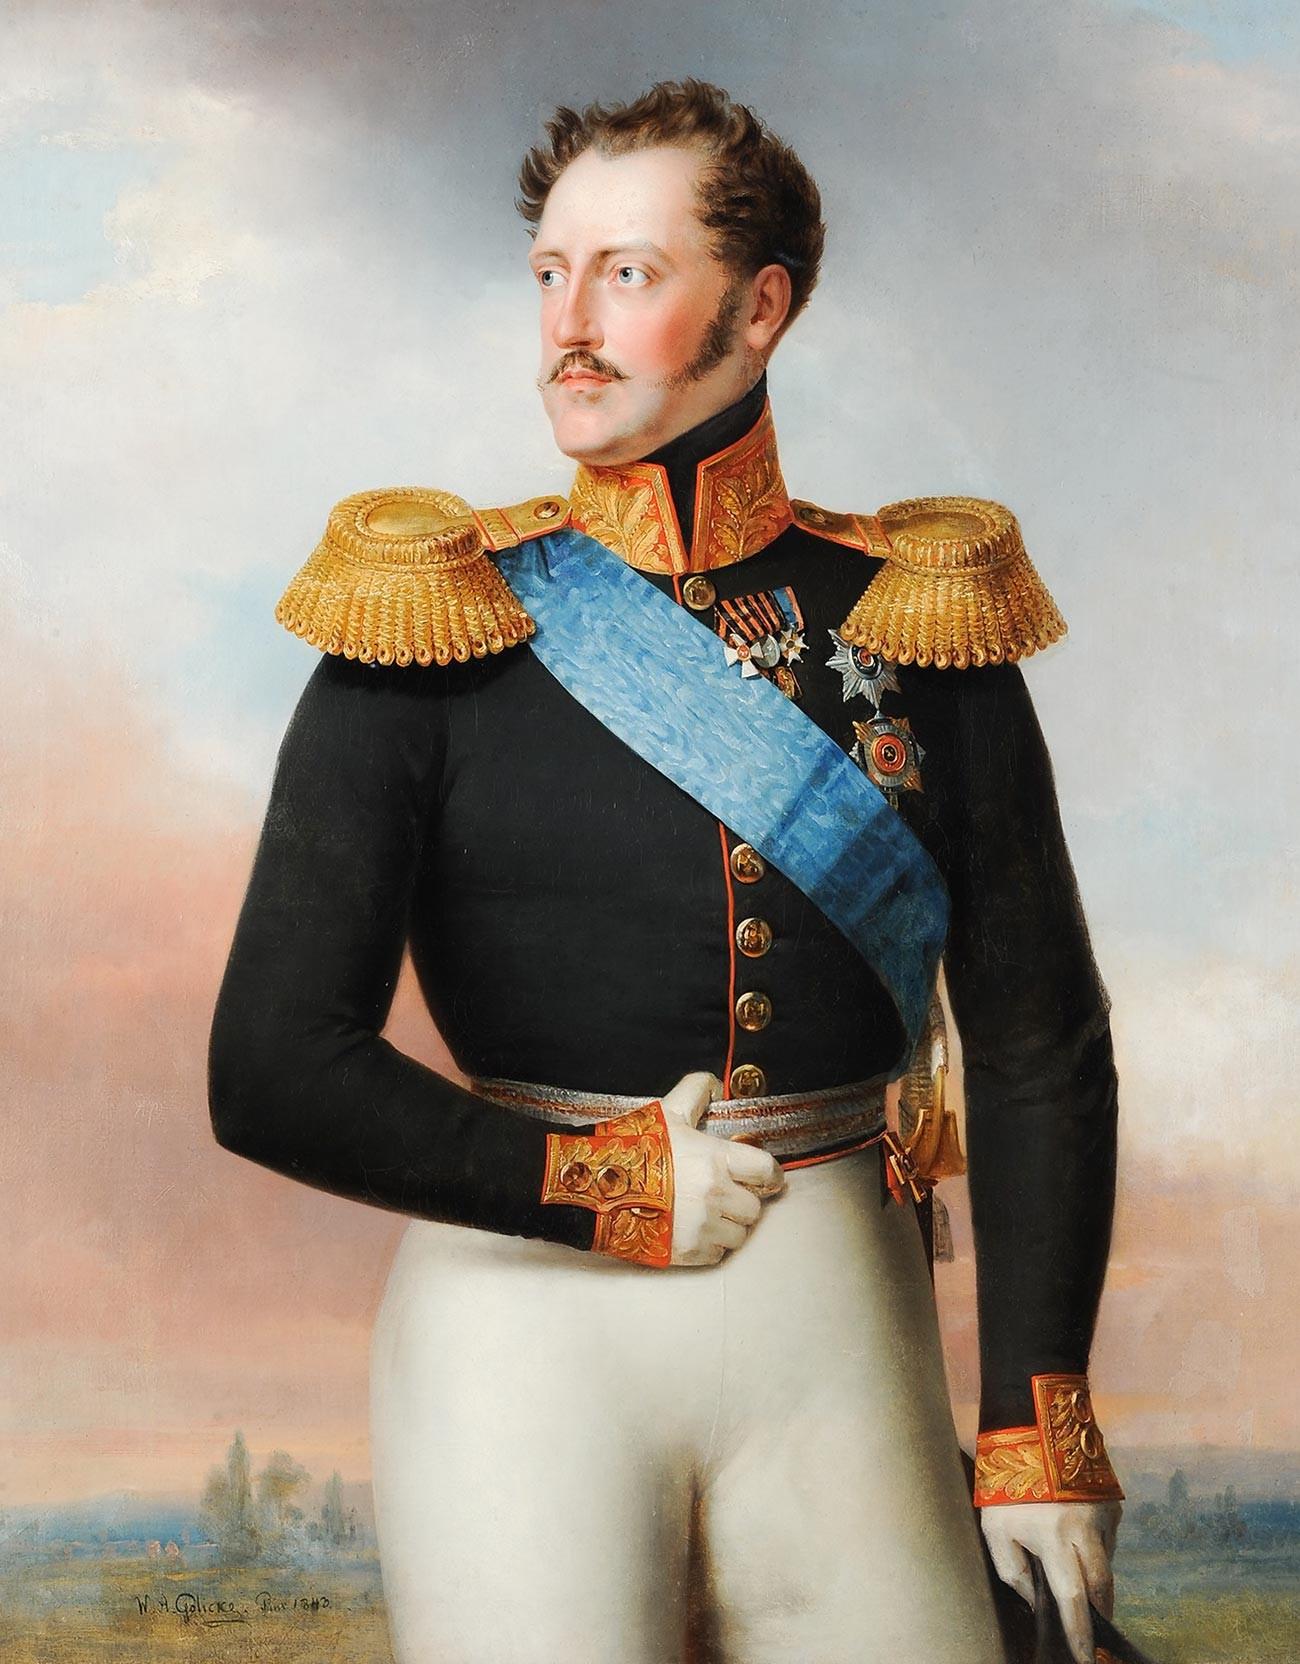 Nicolau 1°.